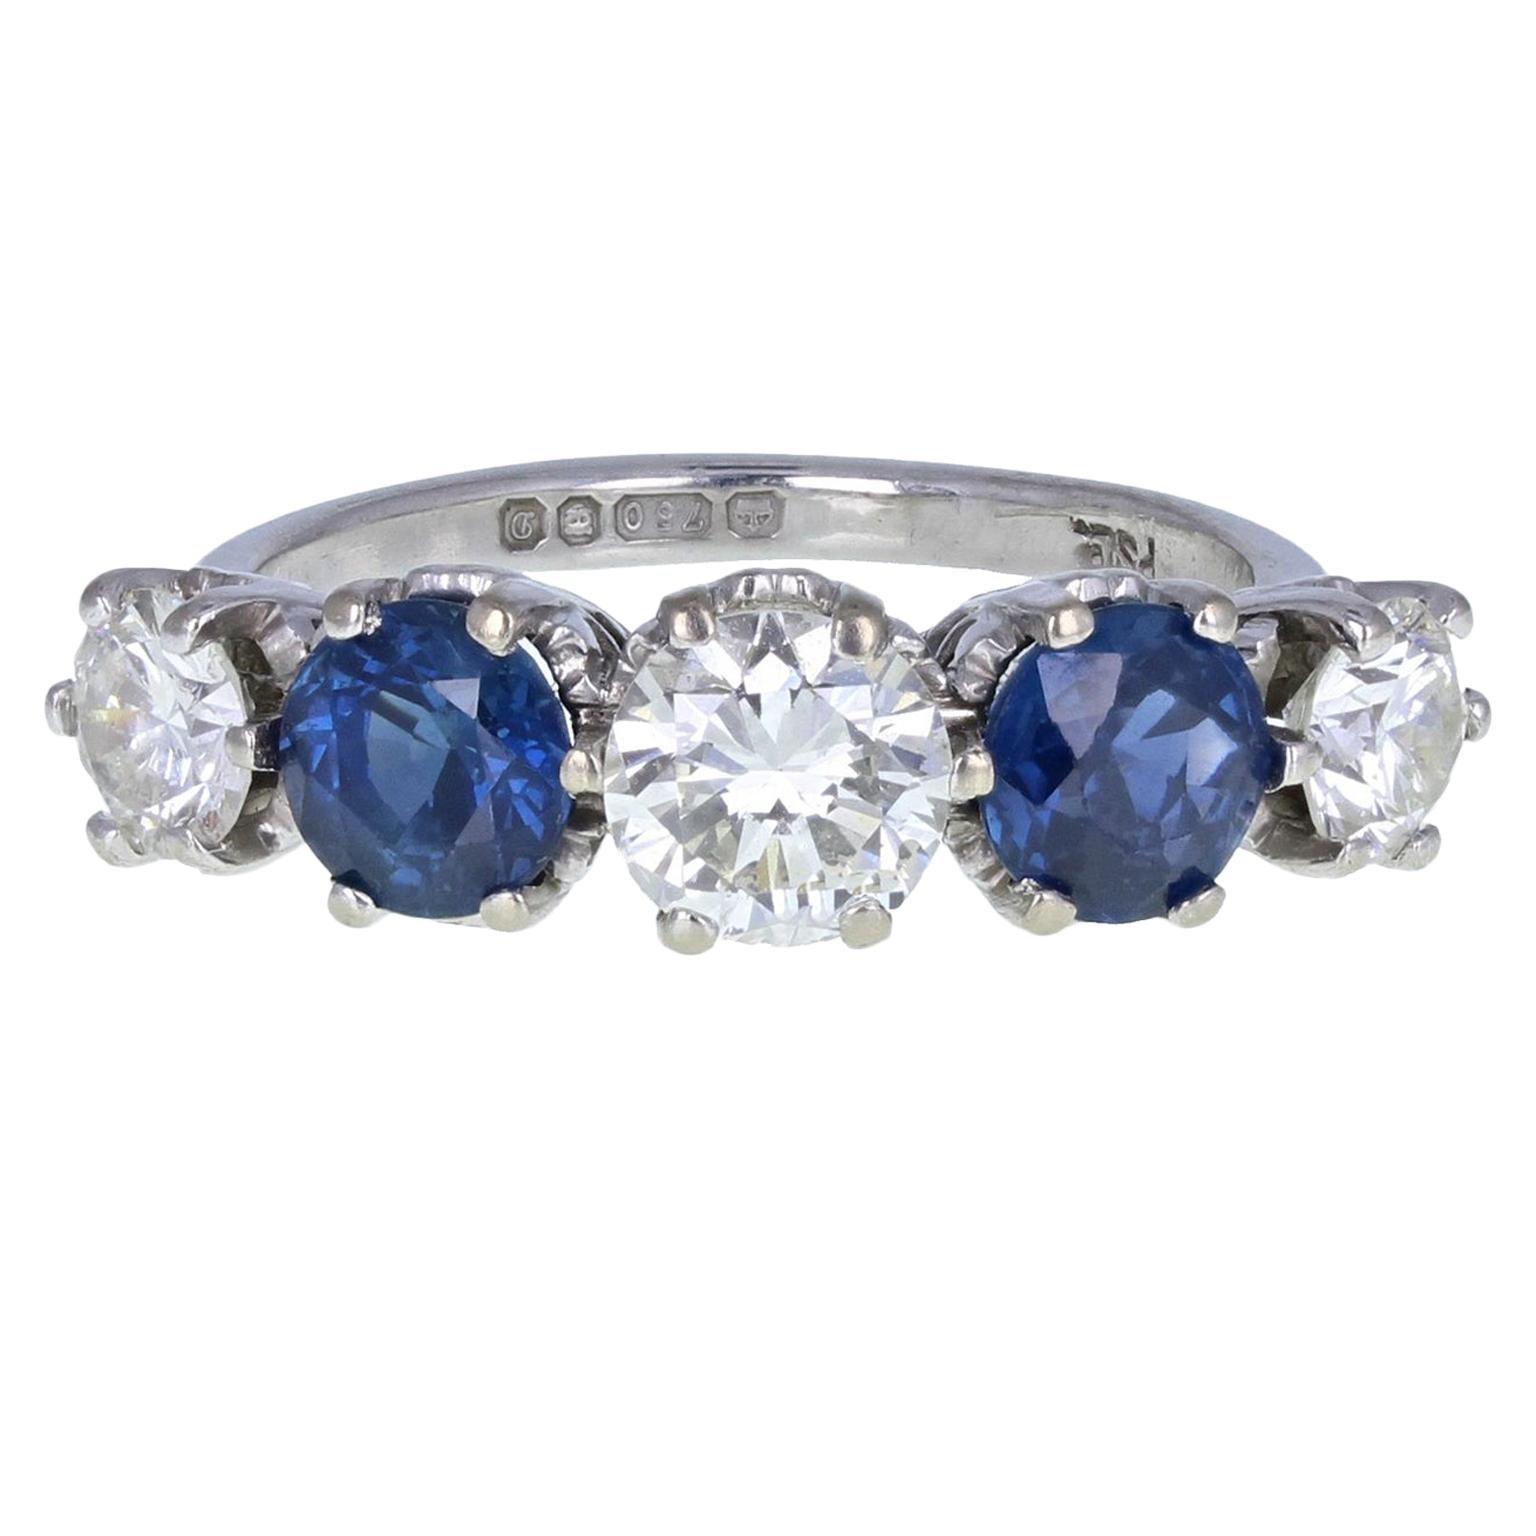 Vintage 18 Carat White Gold Blue Sapphire Diamond Five-Stone Ring